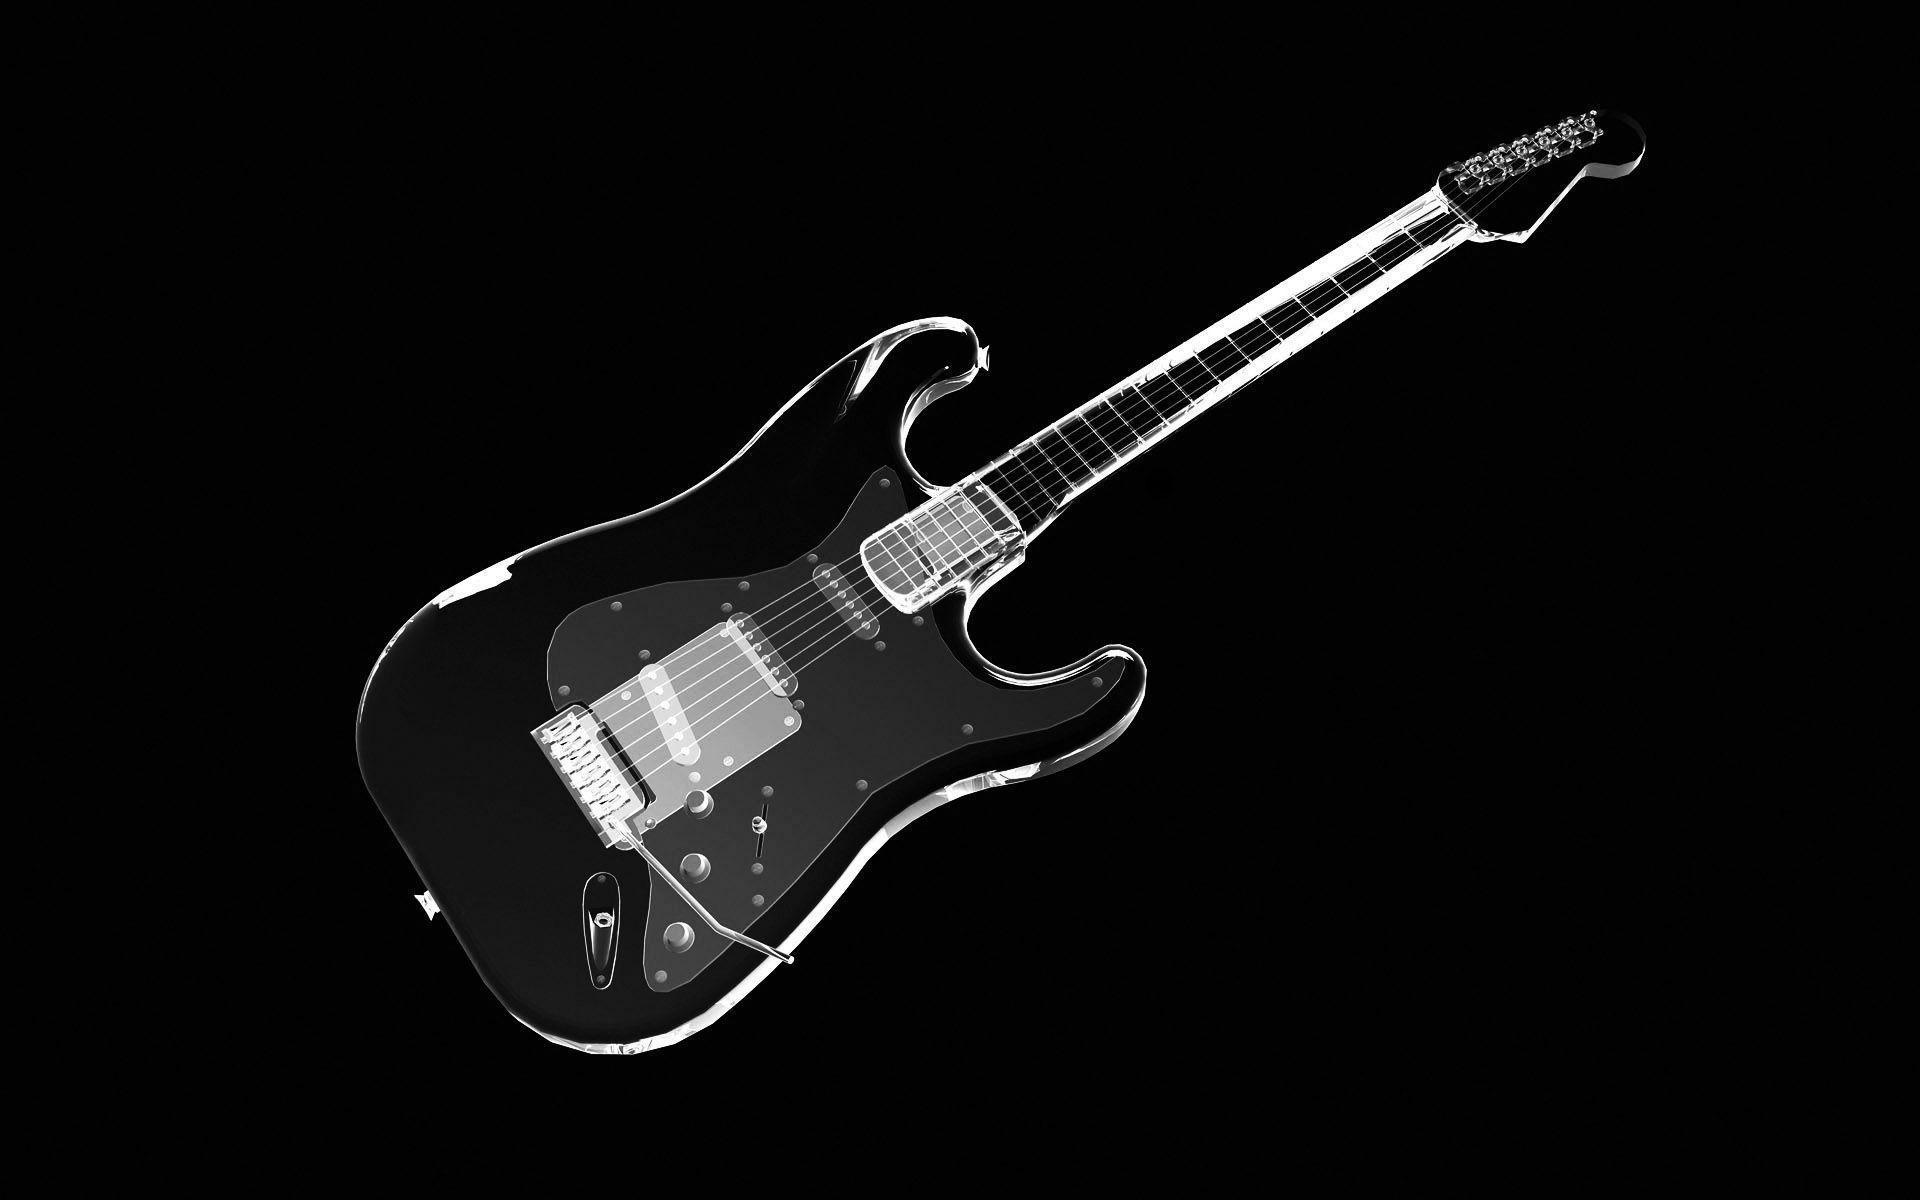 guitar black backgrounds wallpaper cave